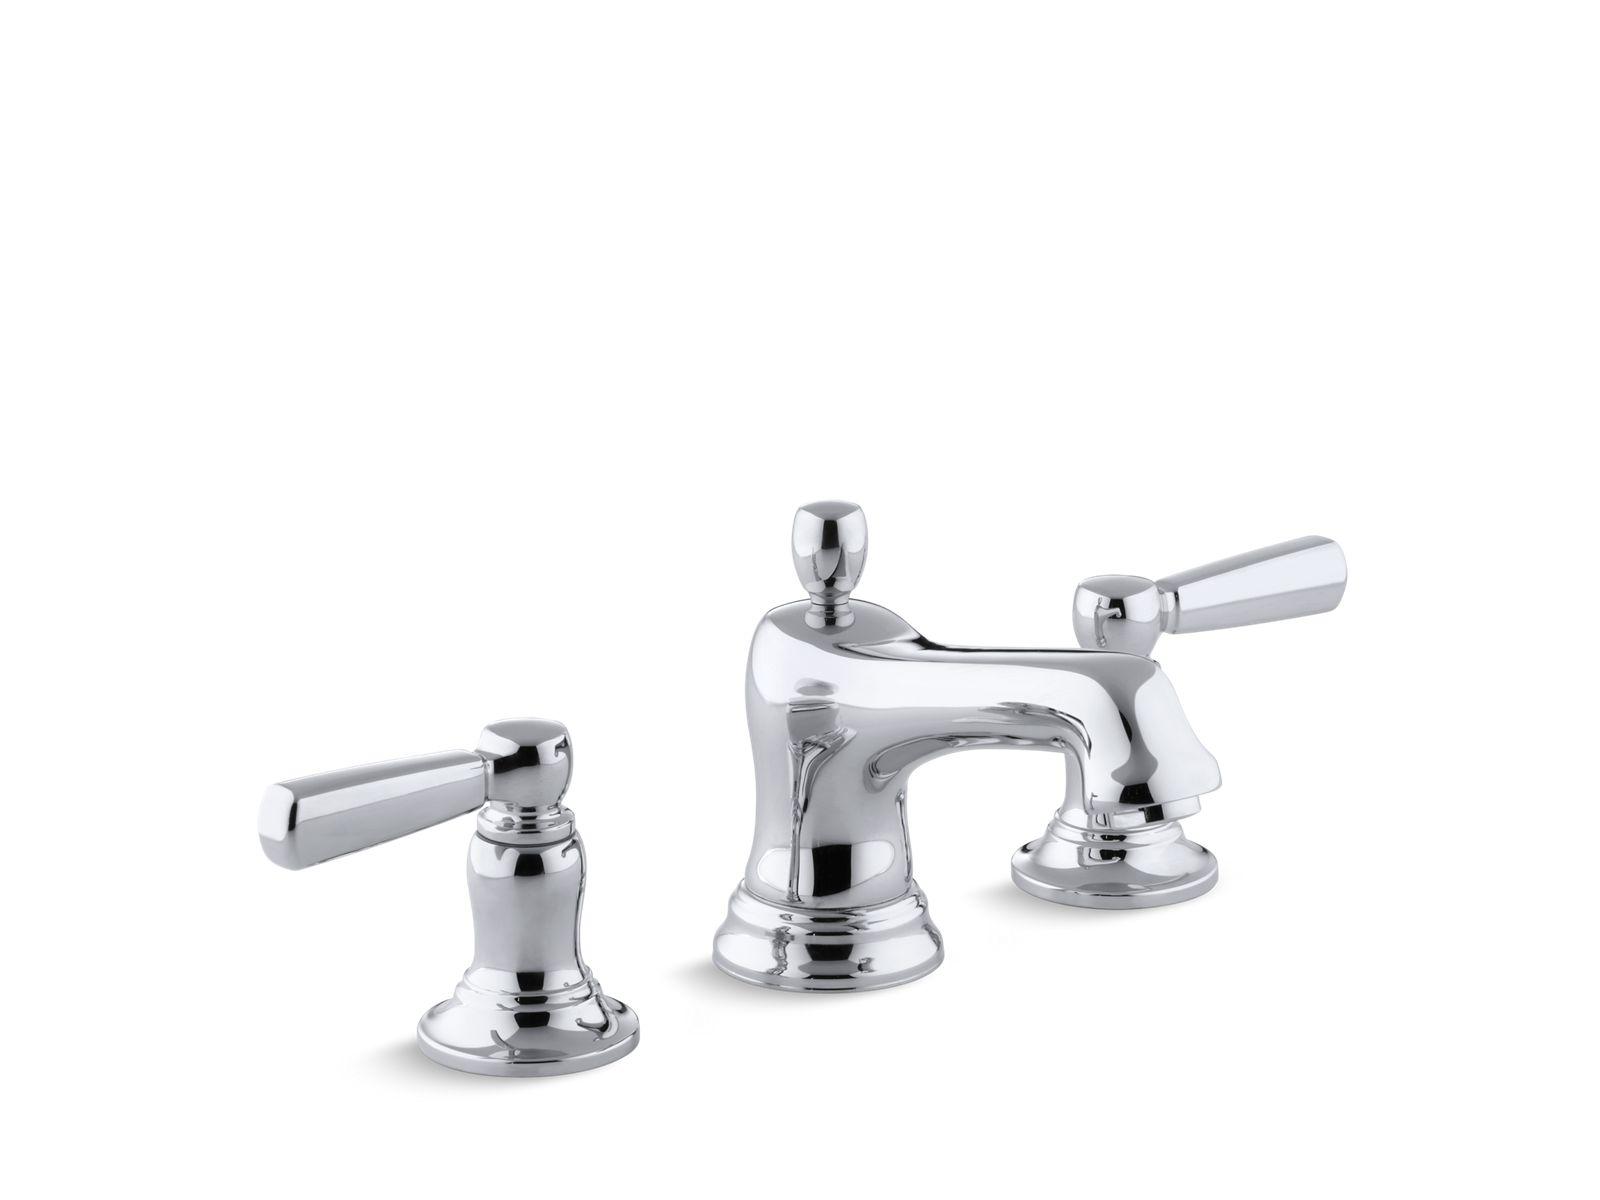 k 10577 4 bancroft widespread sink faucet metal lever handles kohler